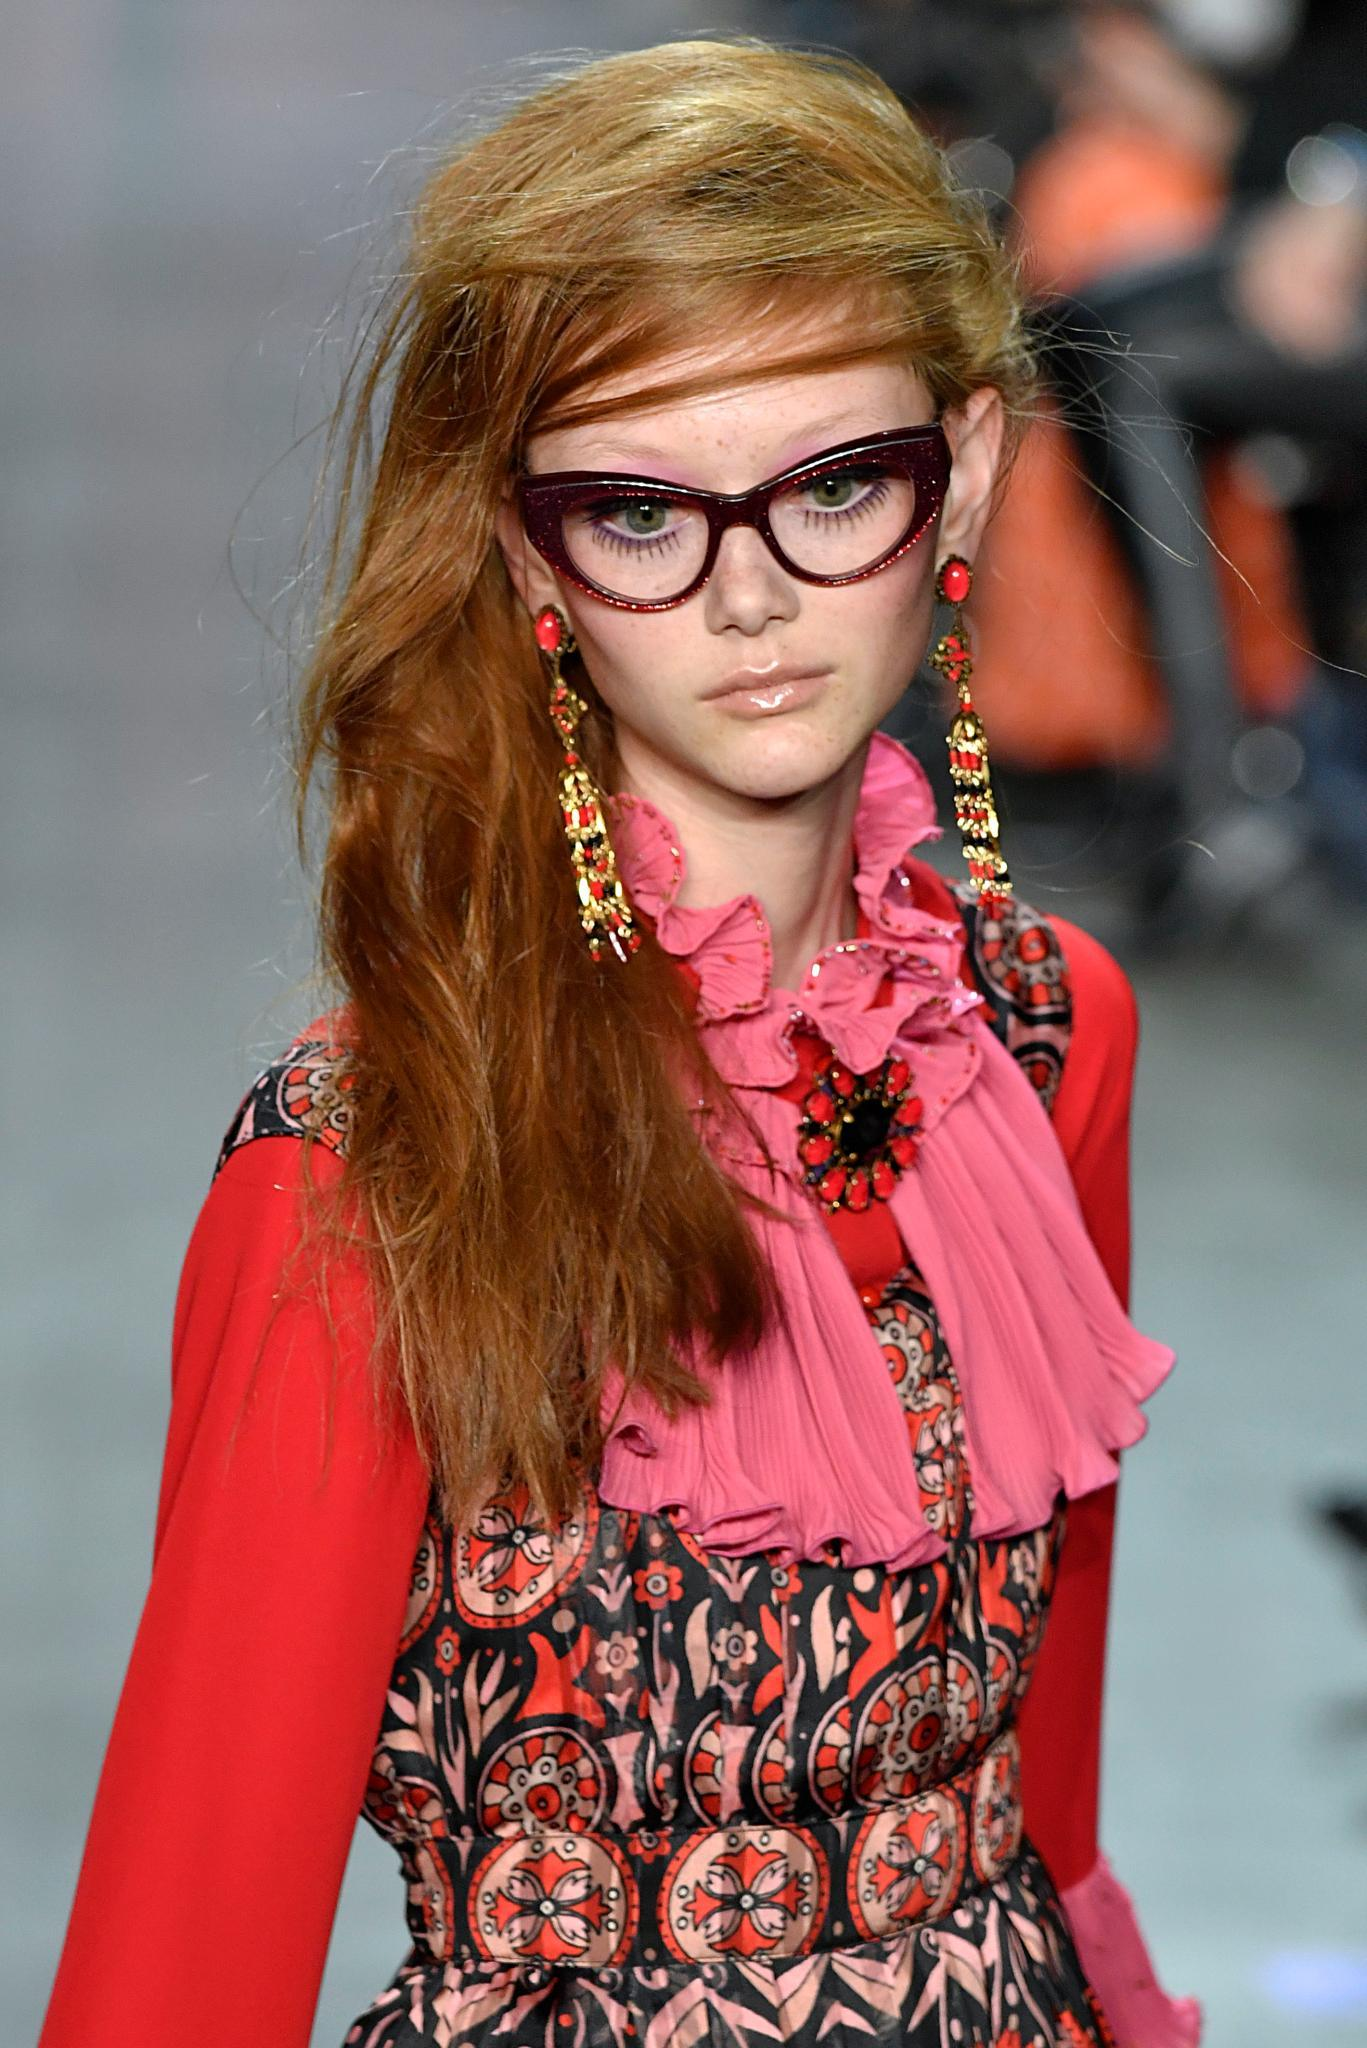 Chica de pelo rojo con peinados batidos para fiestas